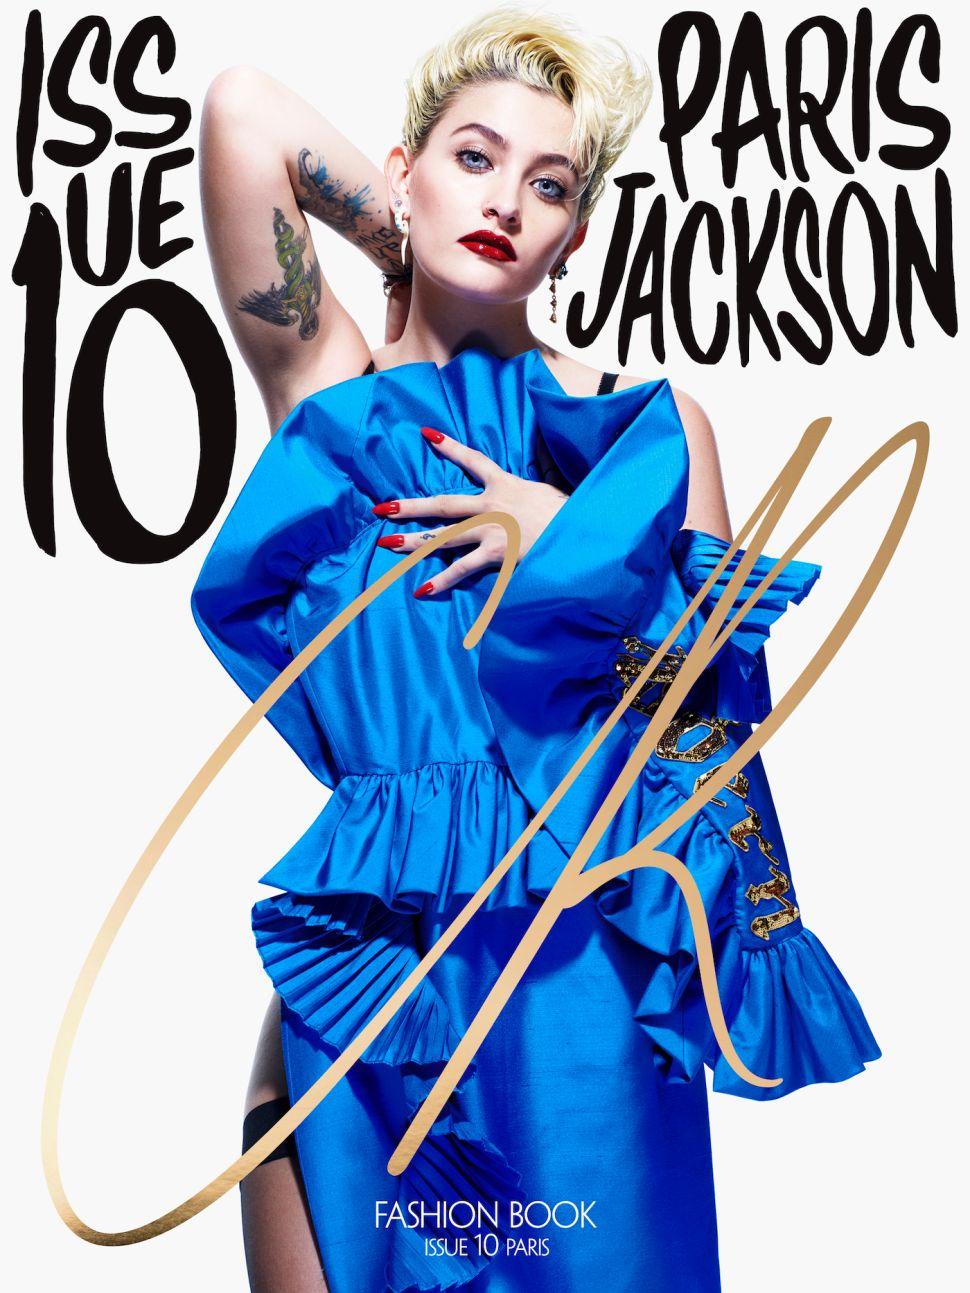 Paris Jackson Lands Her First High Fashion Magazine Cover